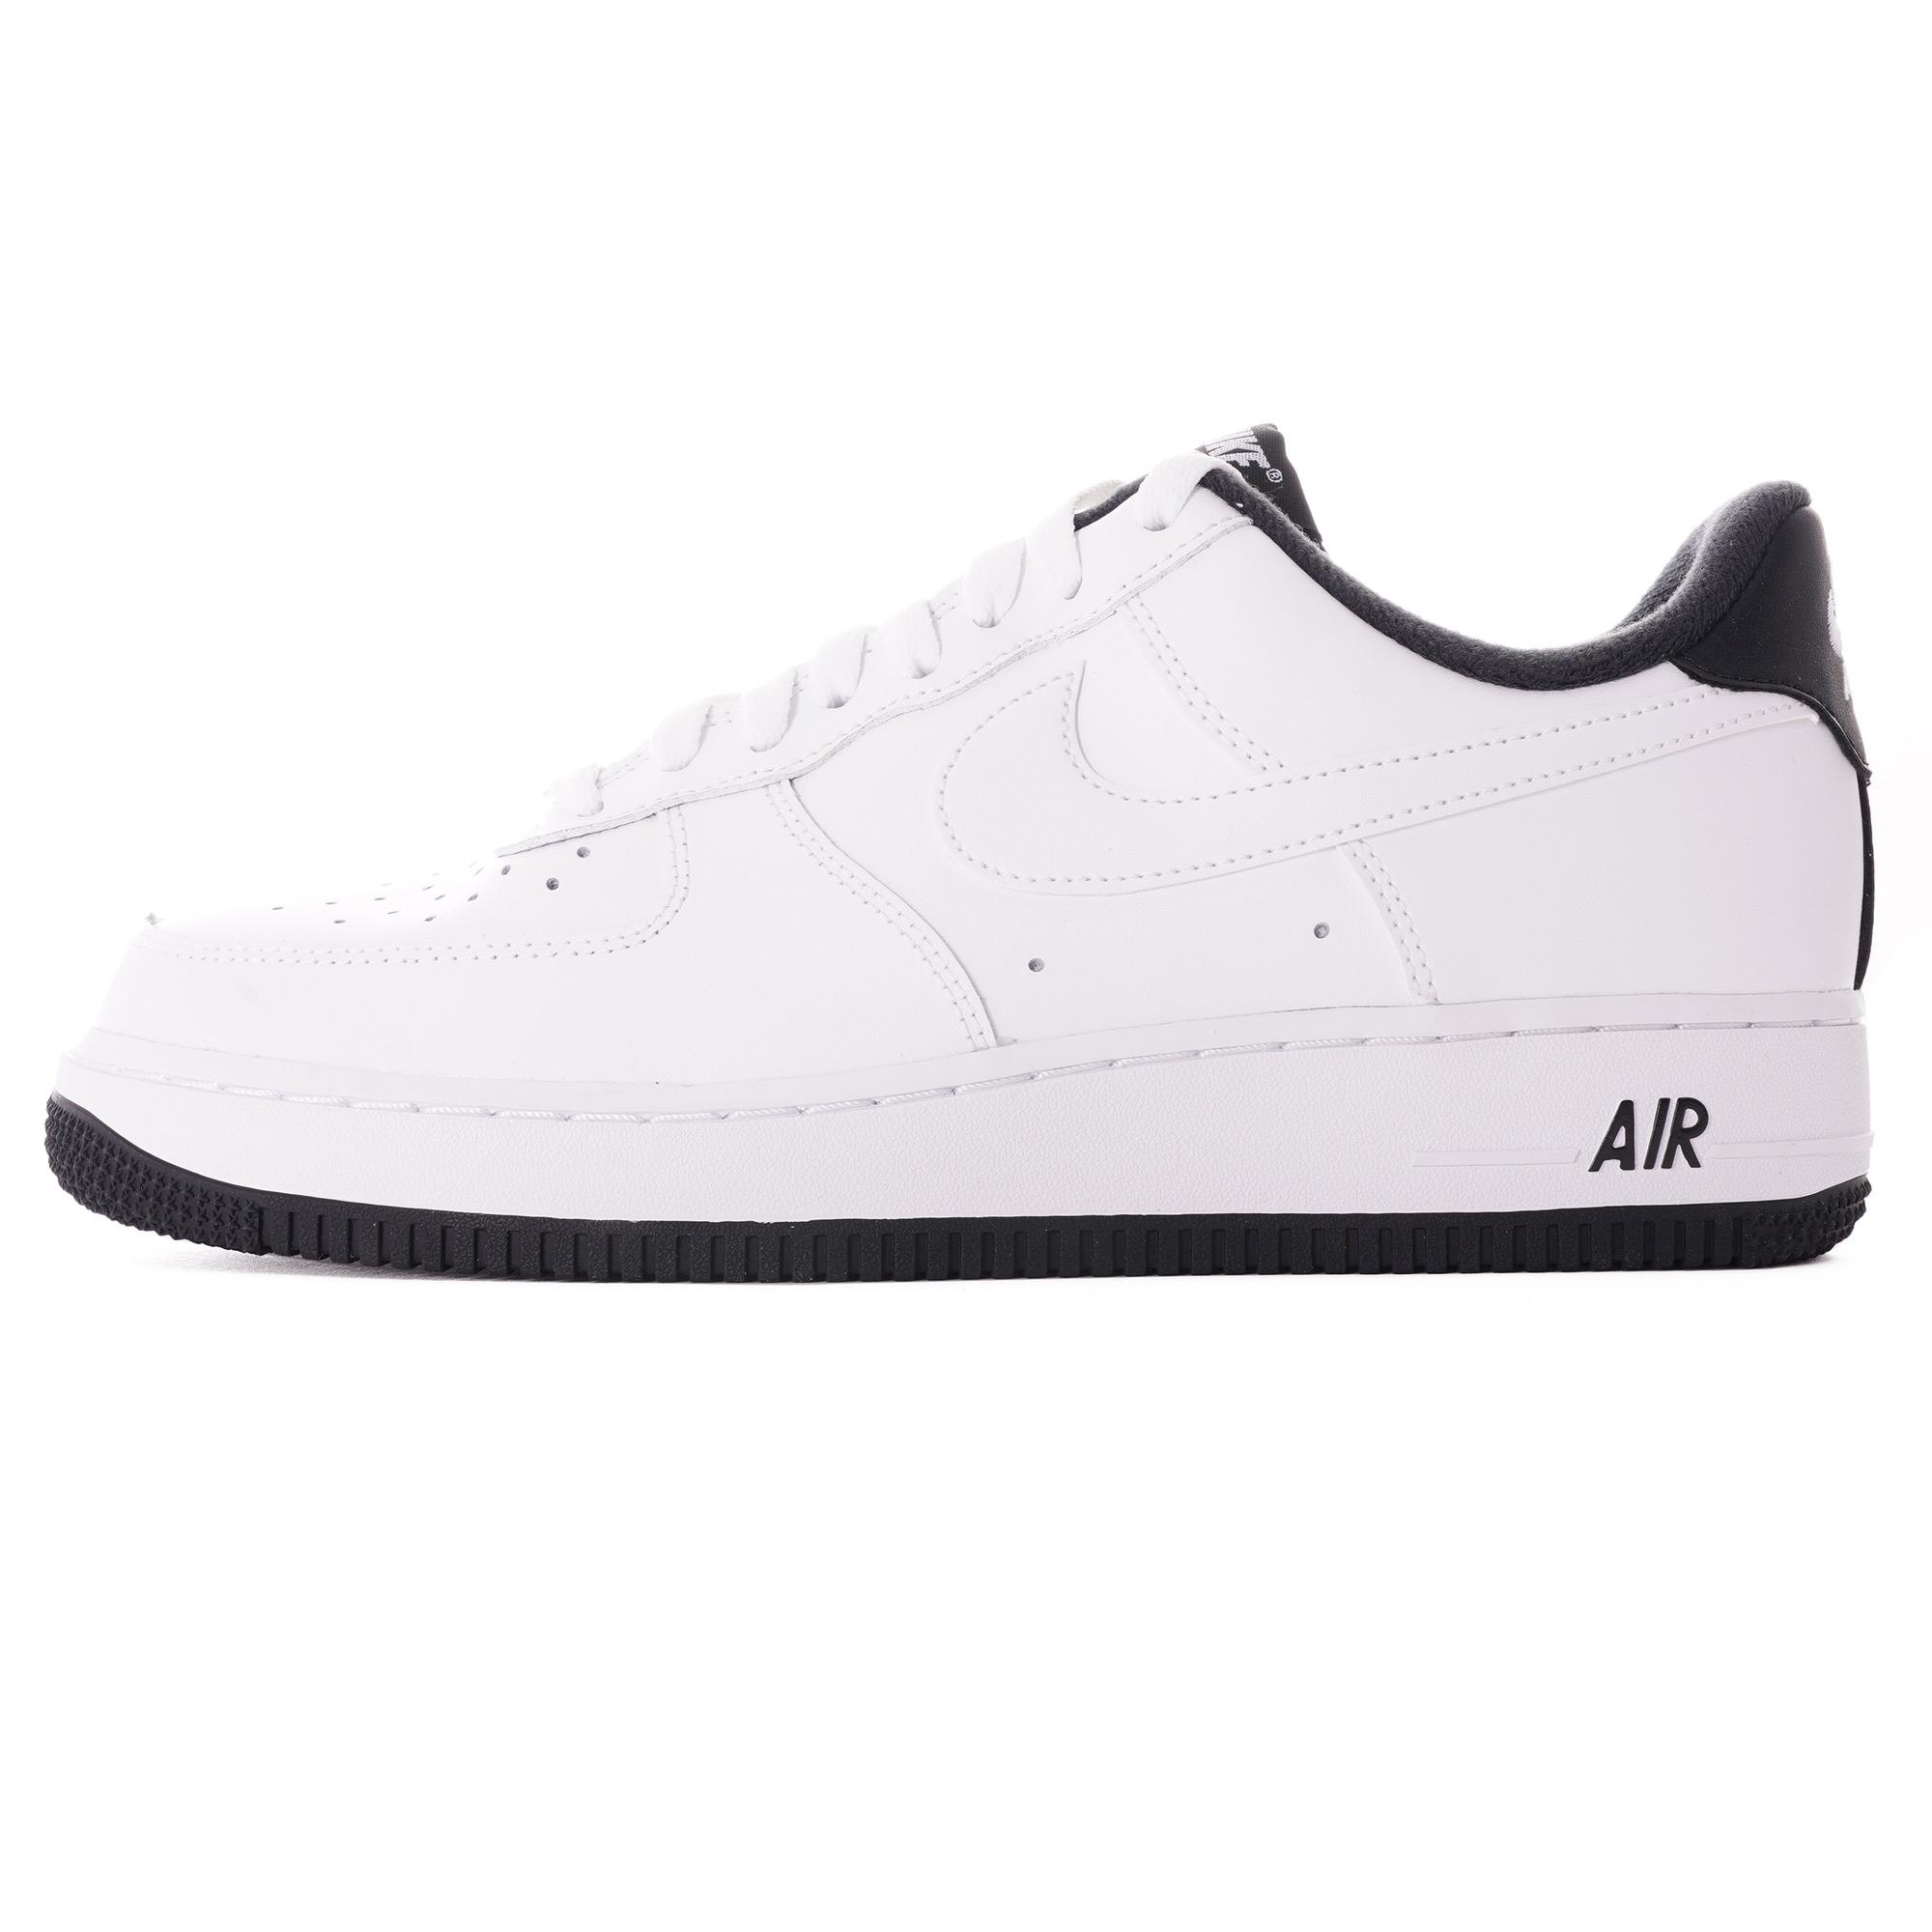 Nike Air Force 1 07 White And Black Cd0884 100